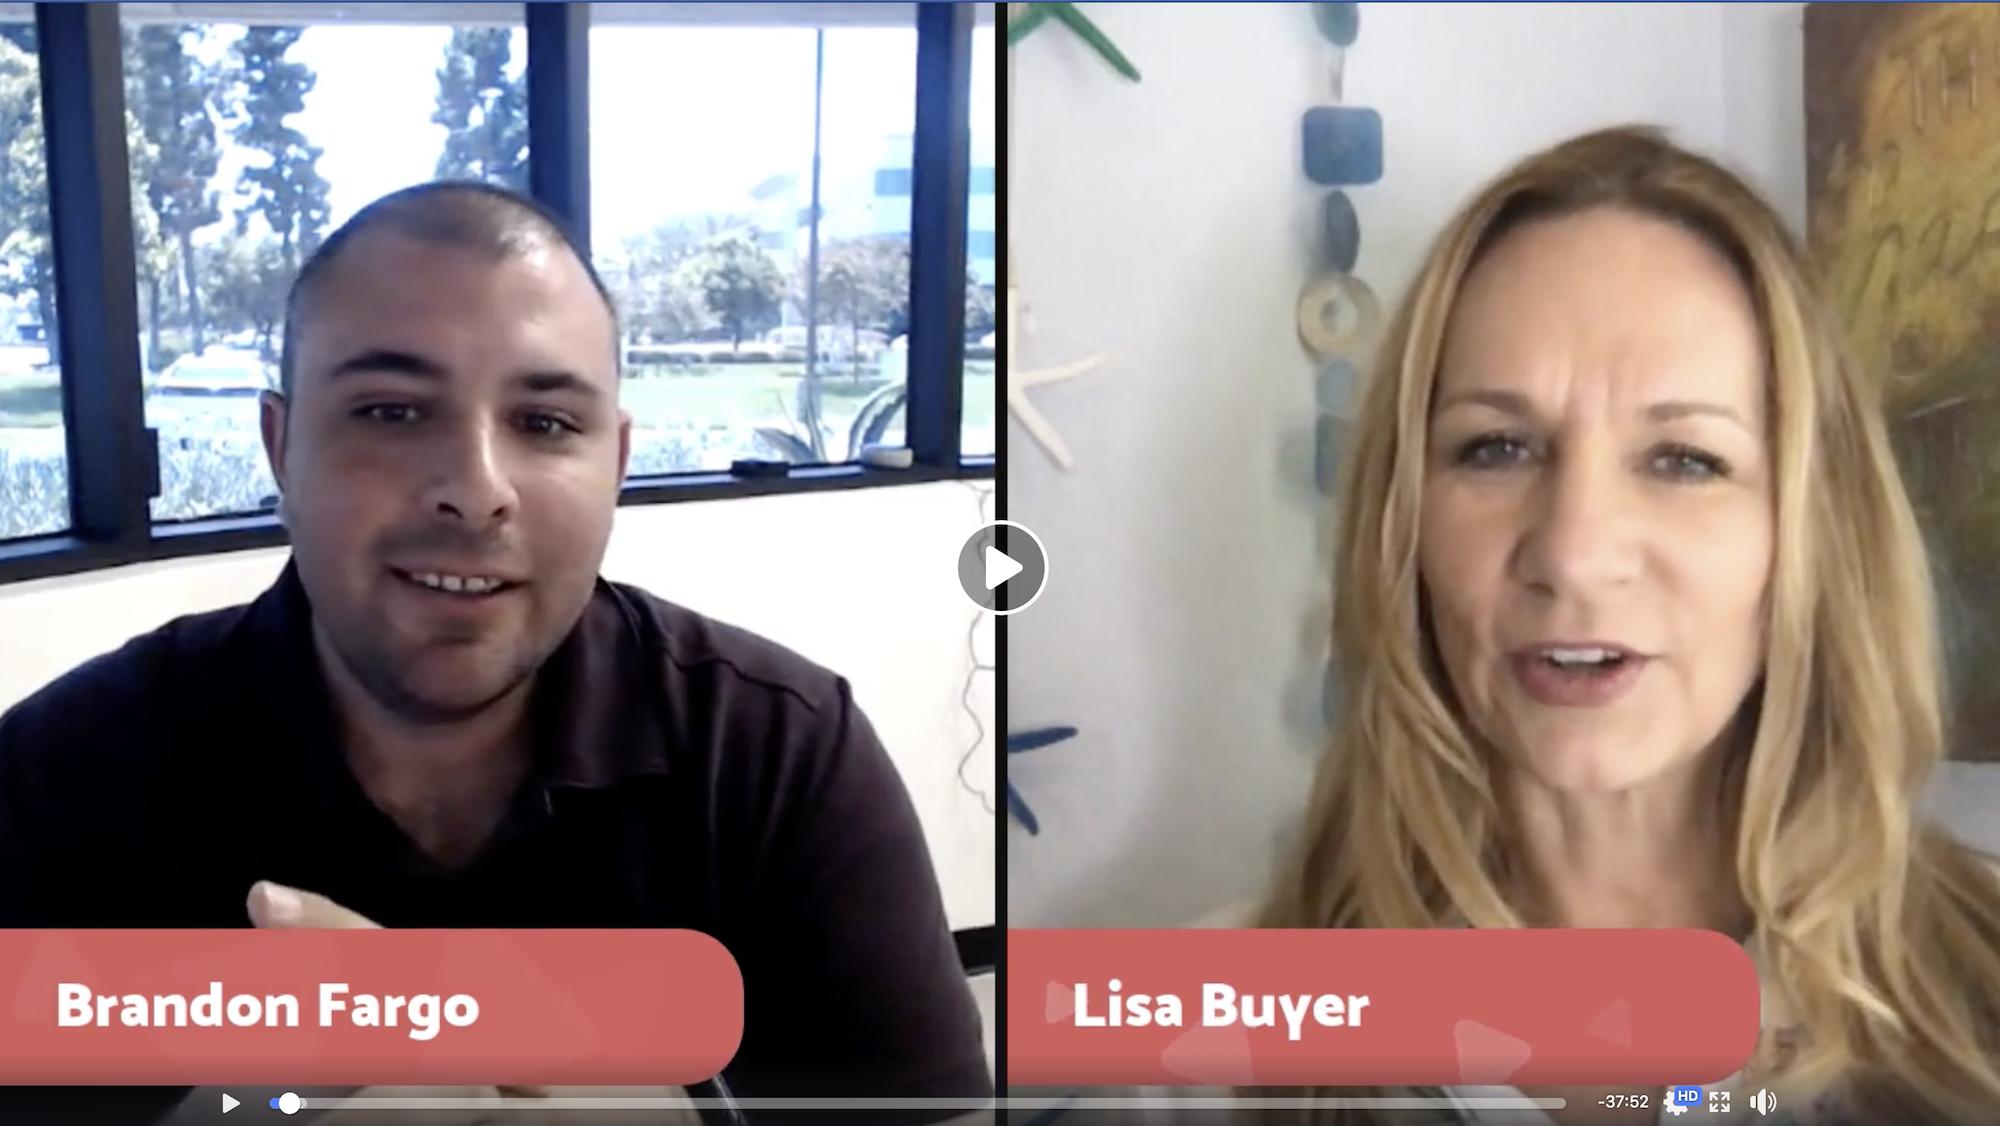 Lisa Buyer interviewing brandon fargo through video call